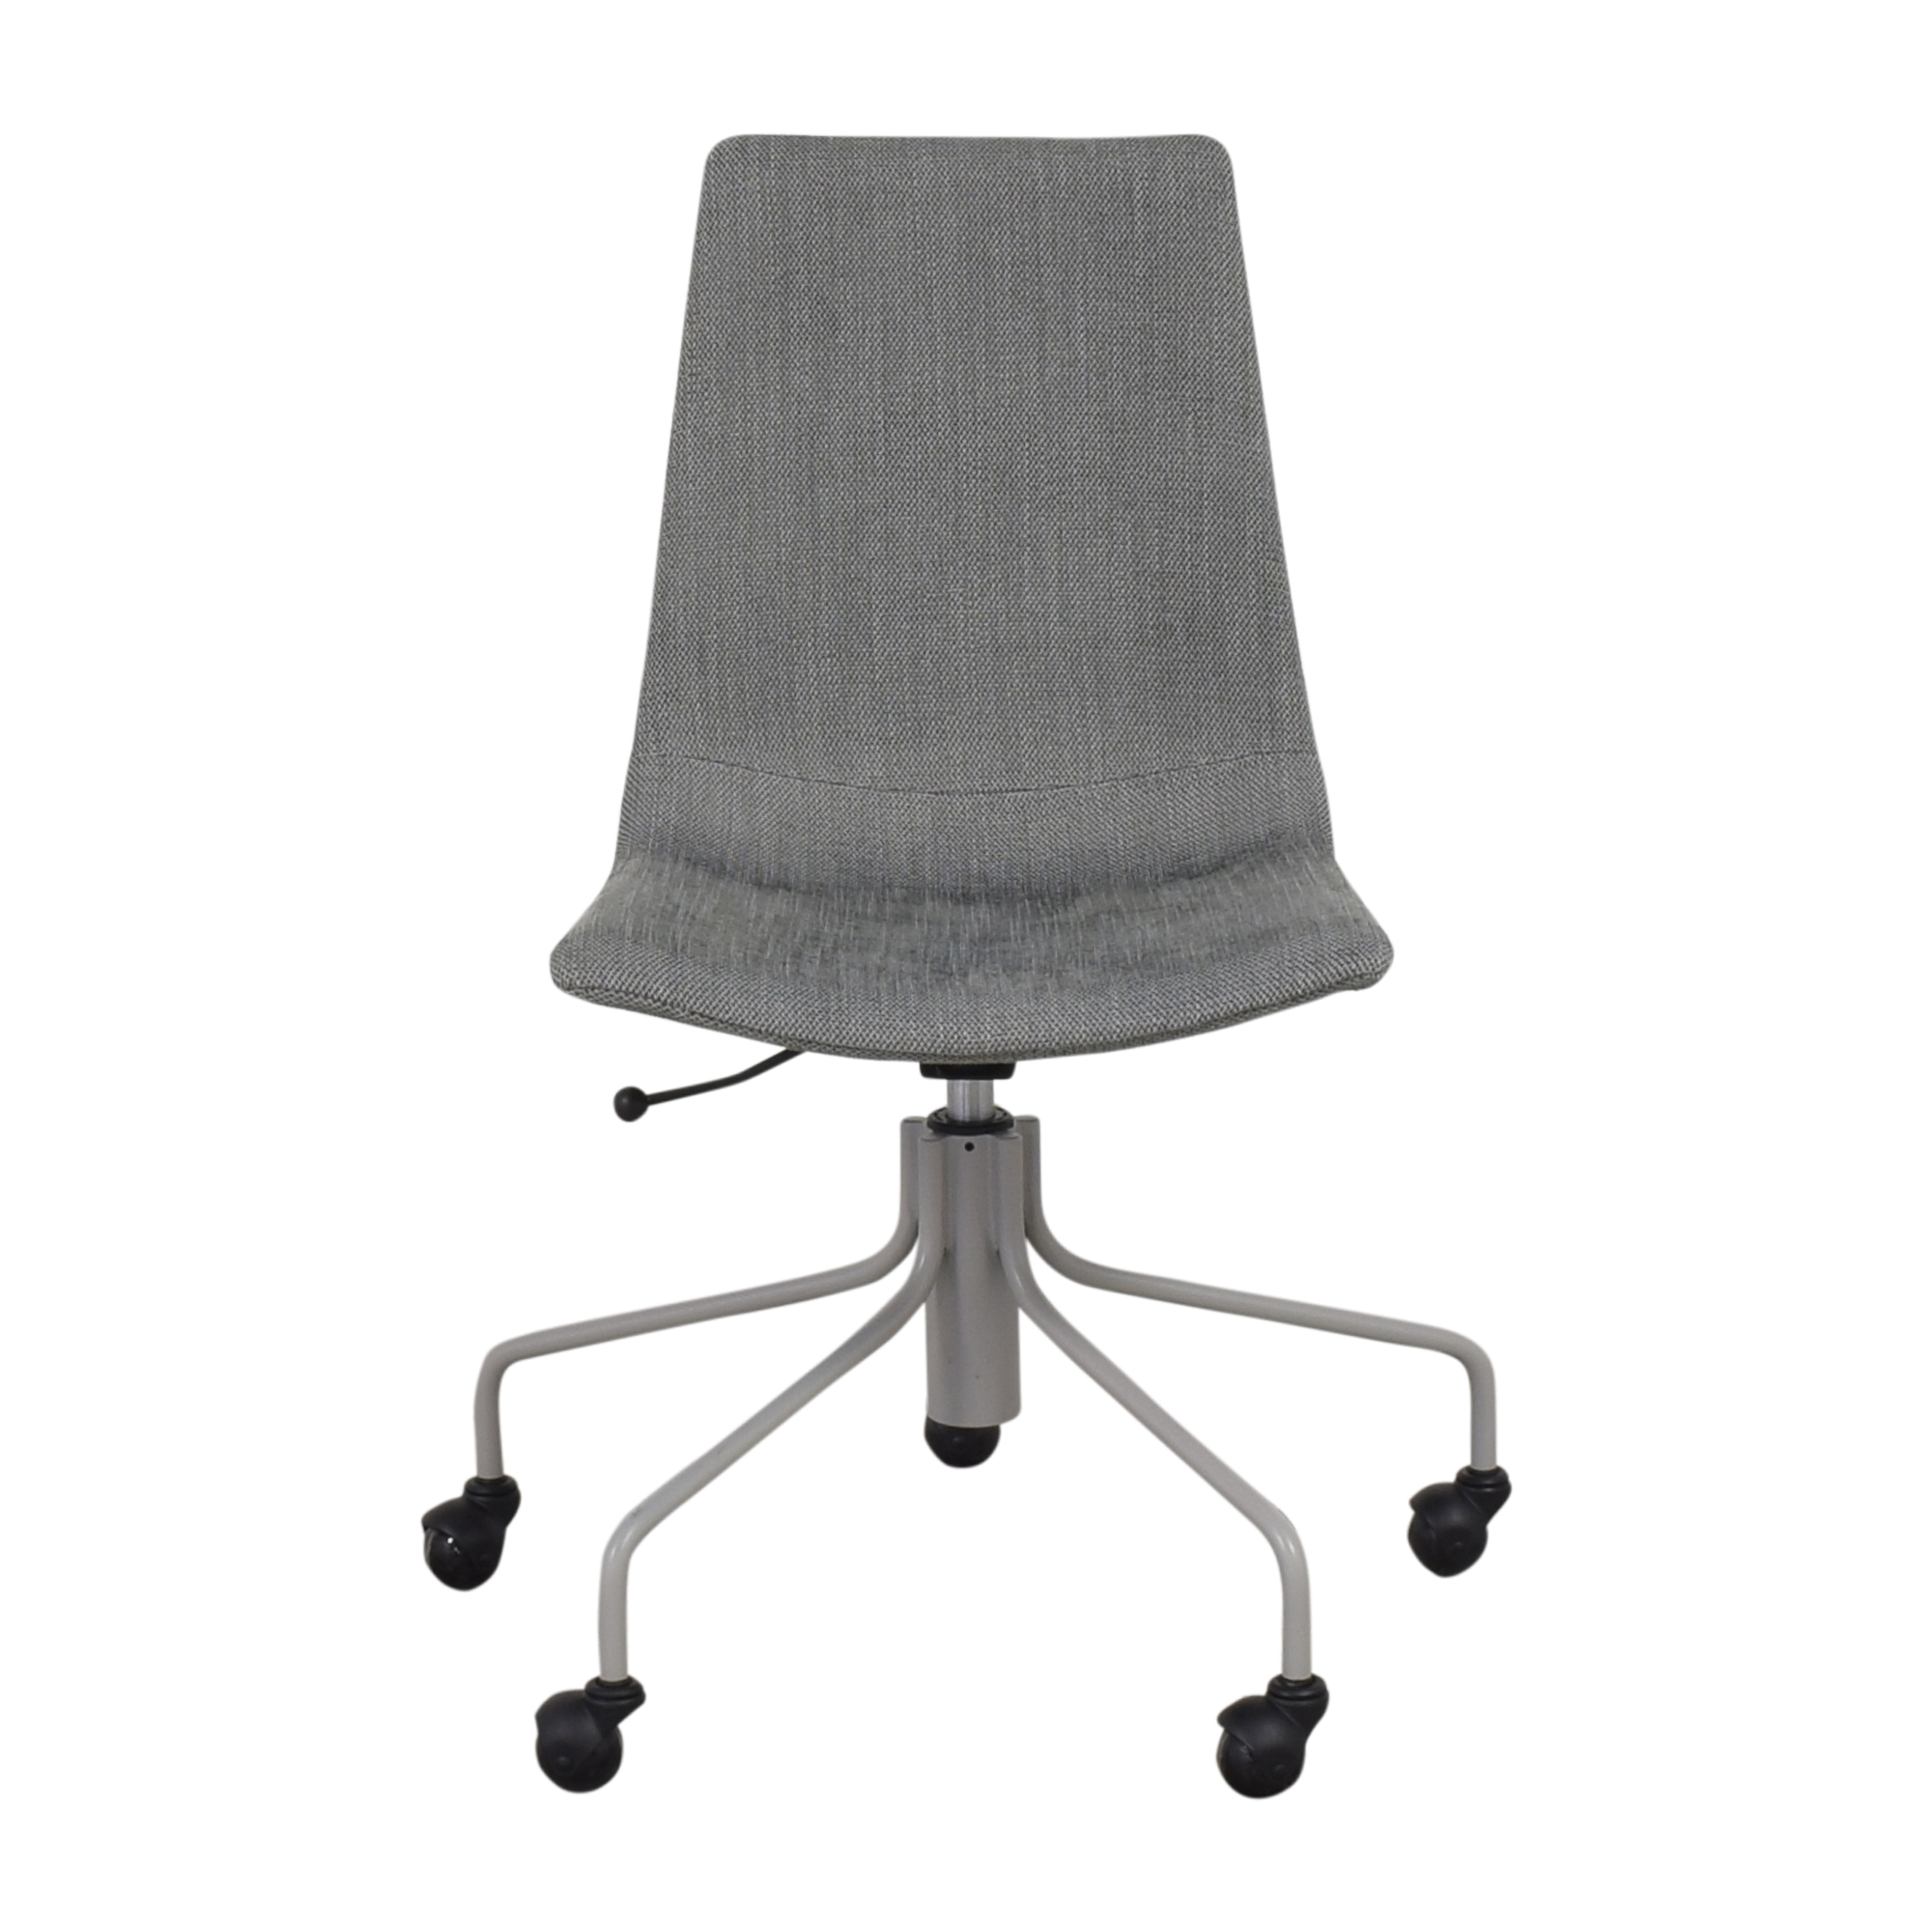 West Elm Modern Slope Upholstered Swivel Office Chair sale